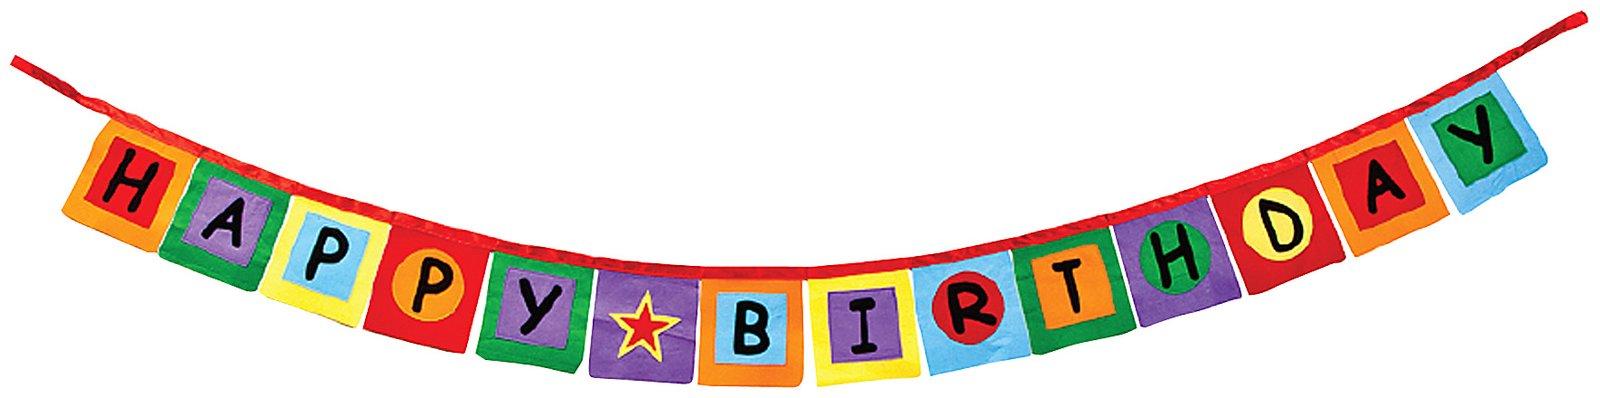 1600x398 Wonderful Happy Birthday Free Clip Art Black And White Looks